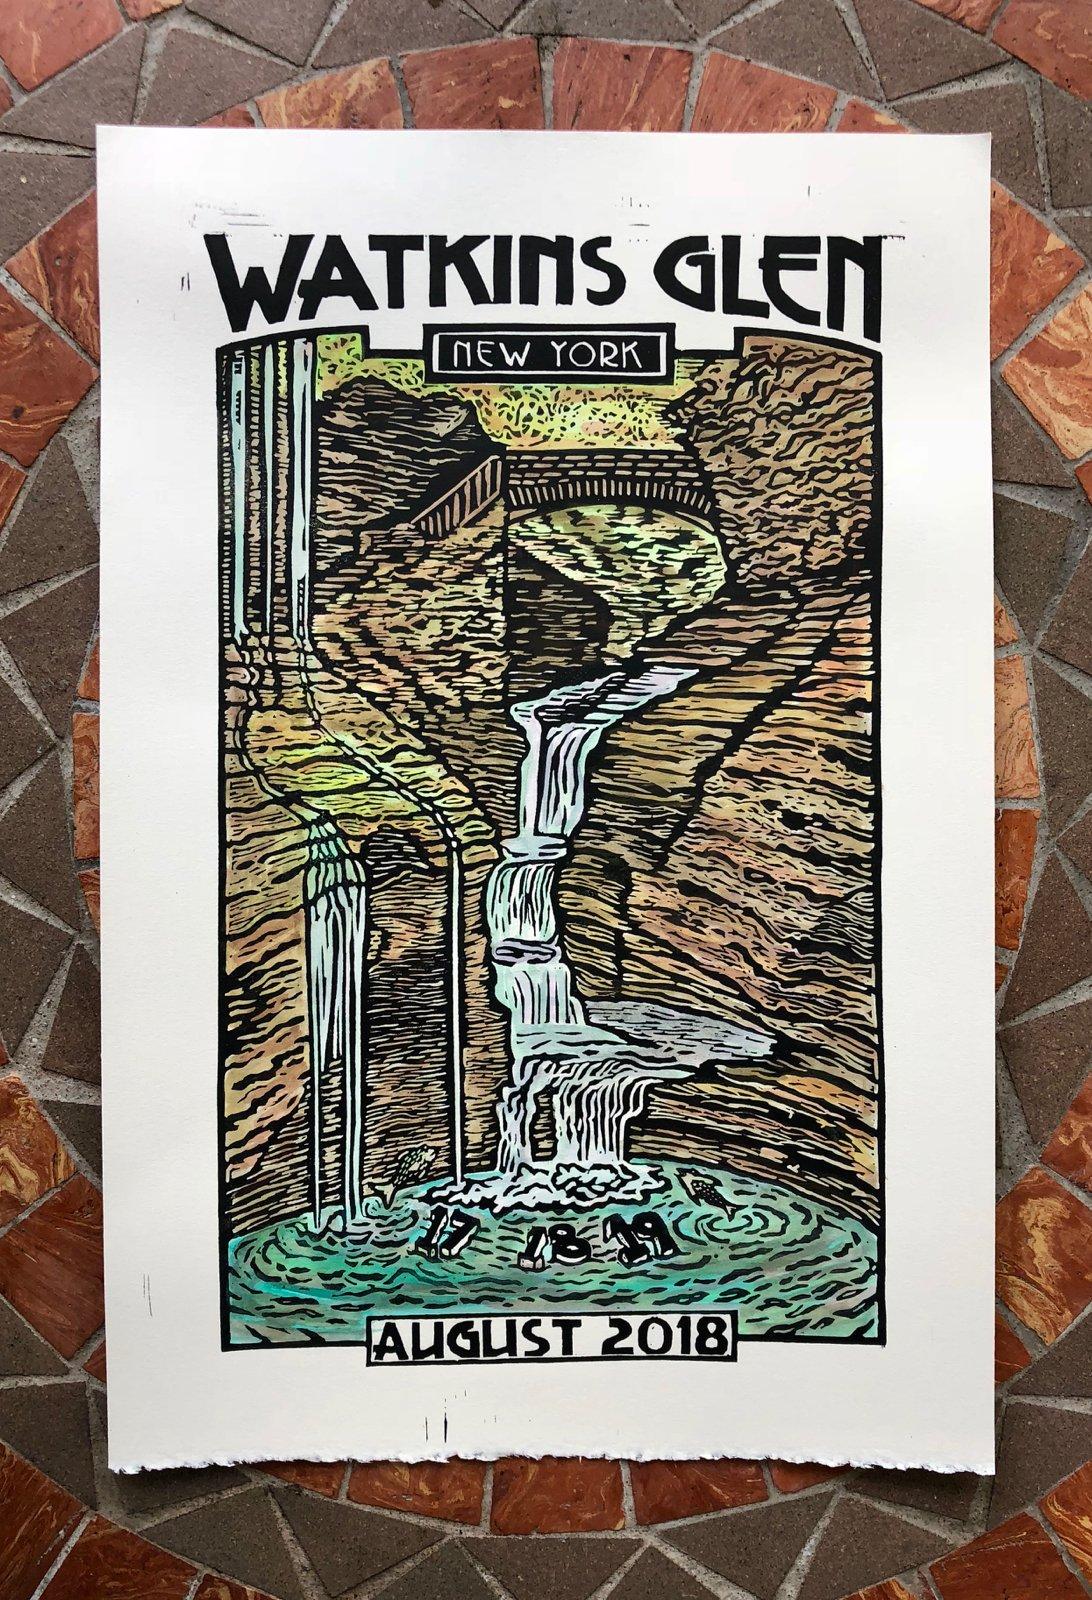 Image of Watkins Glen print